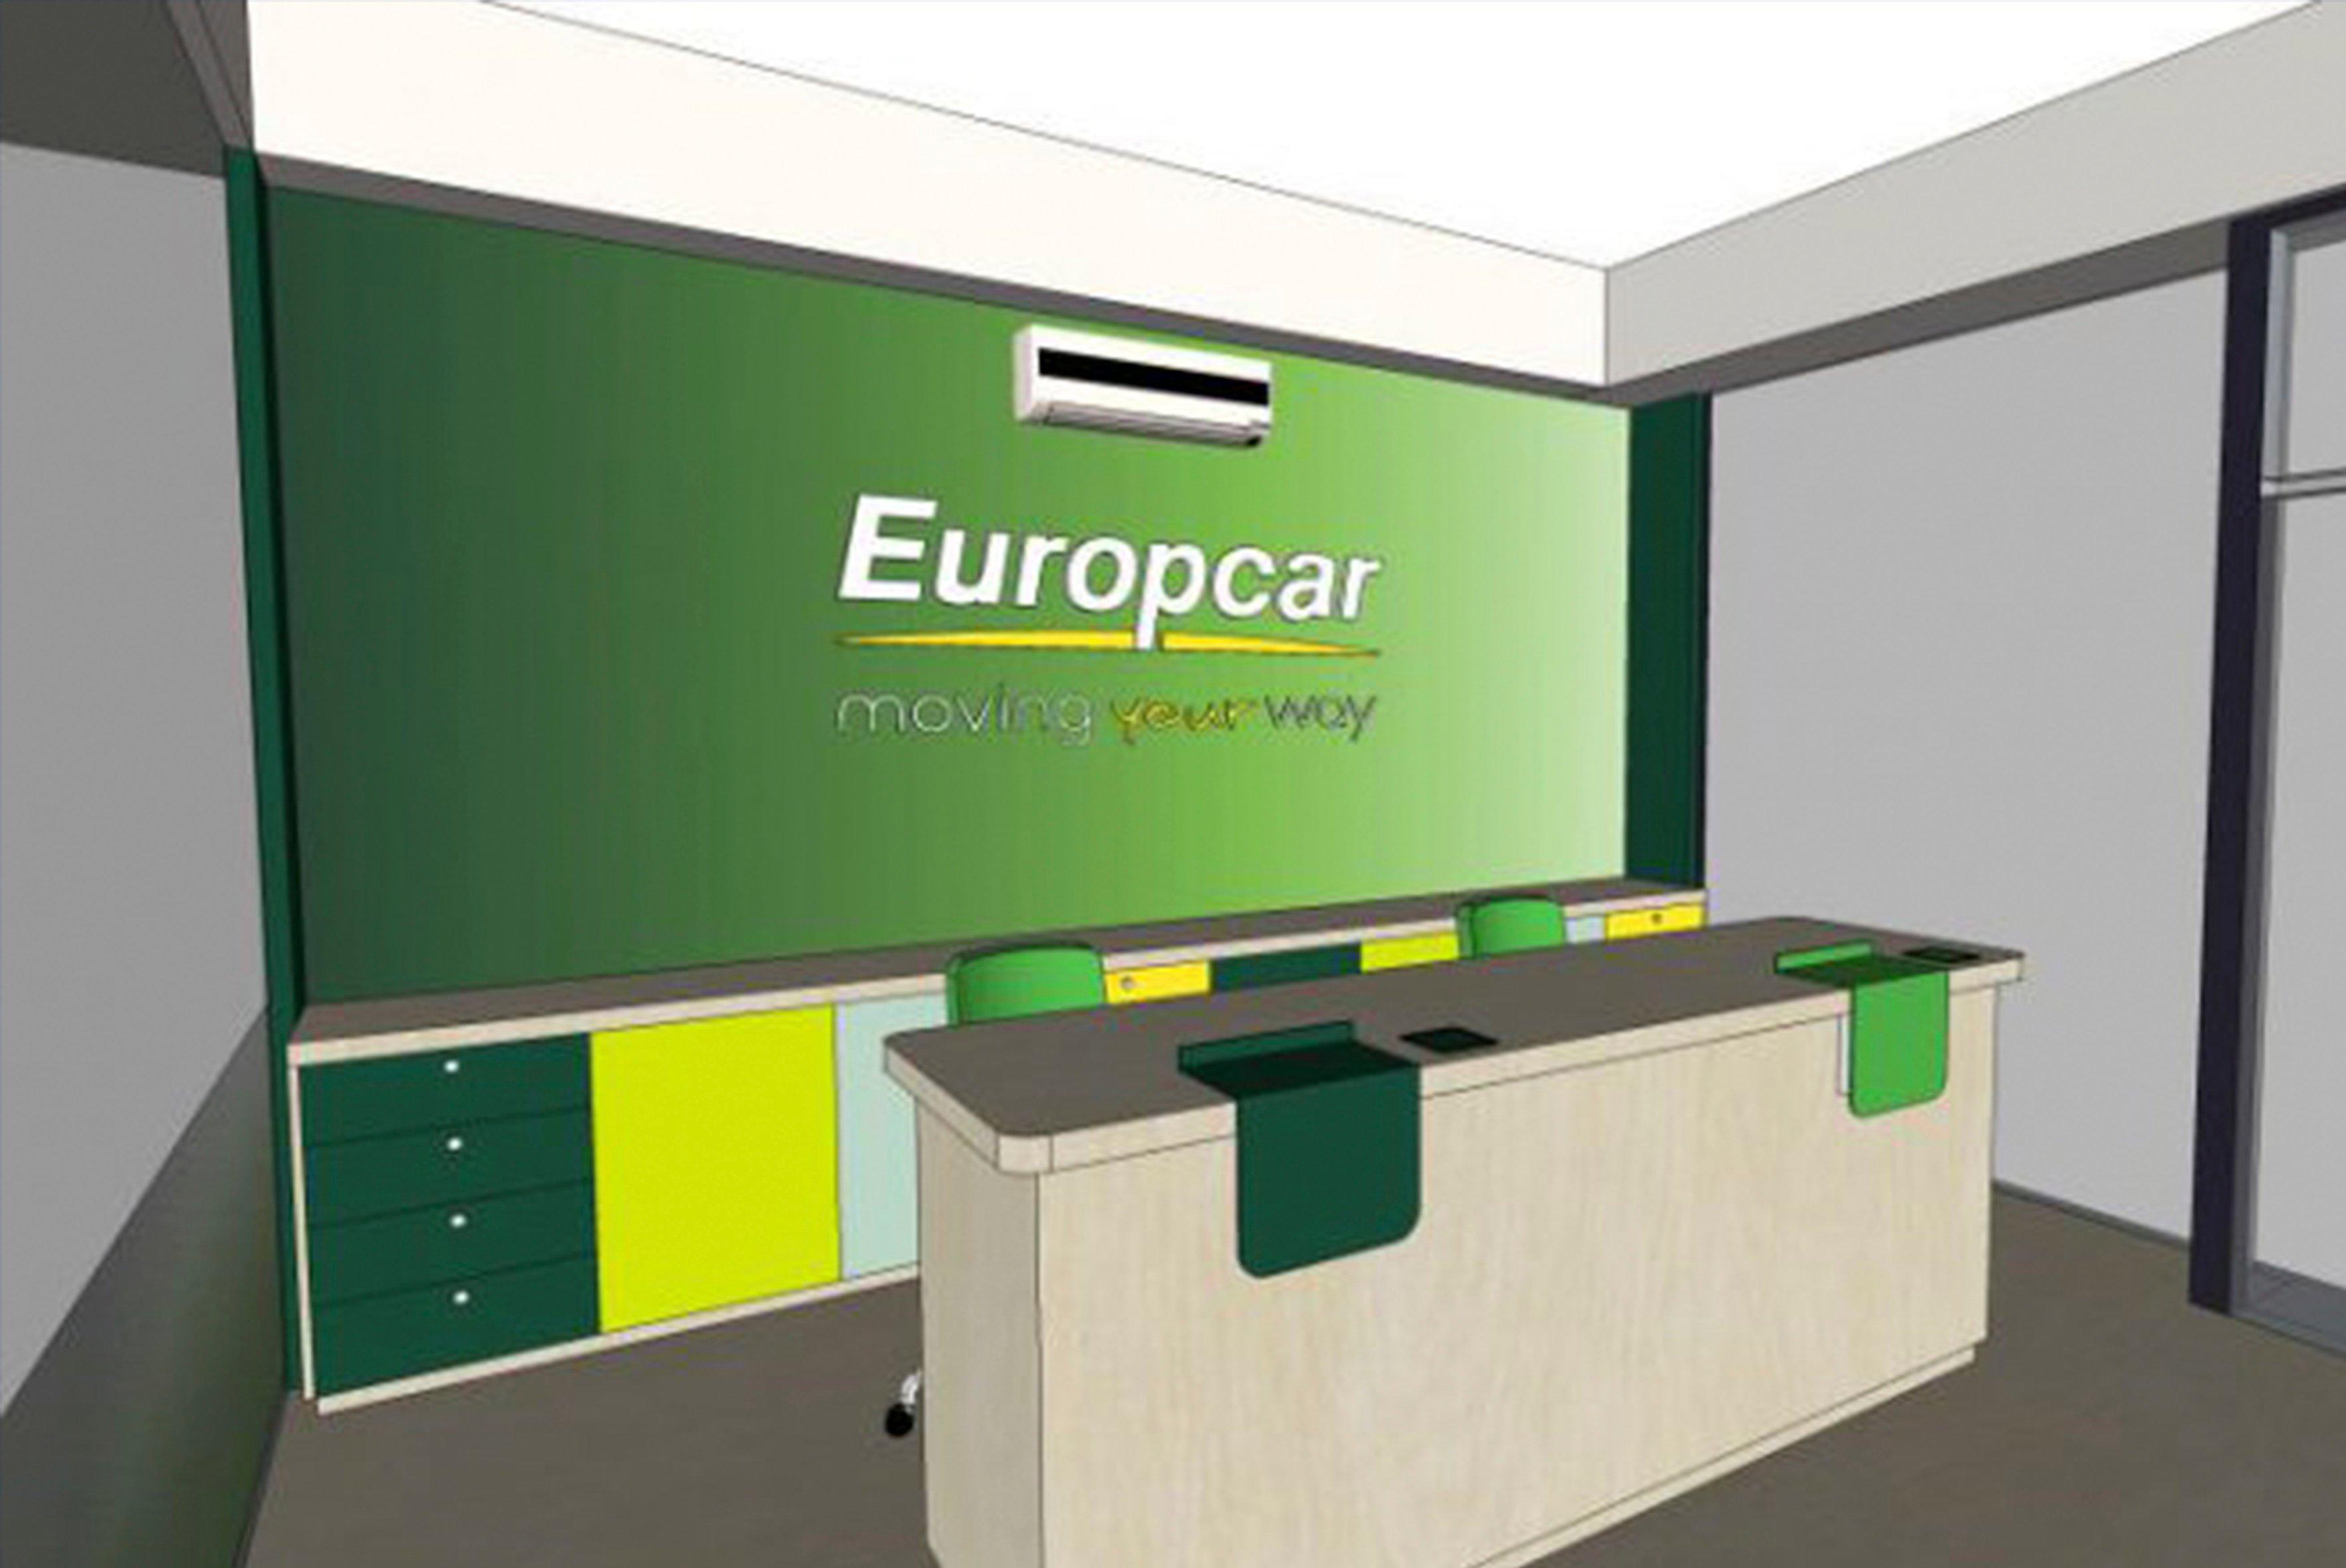 Europcar artwork for website page